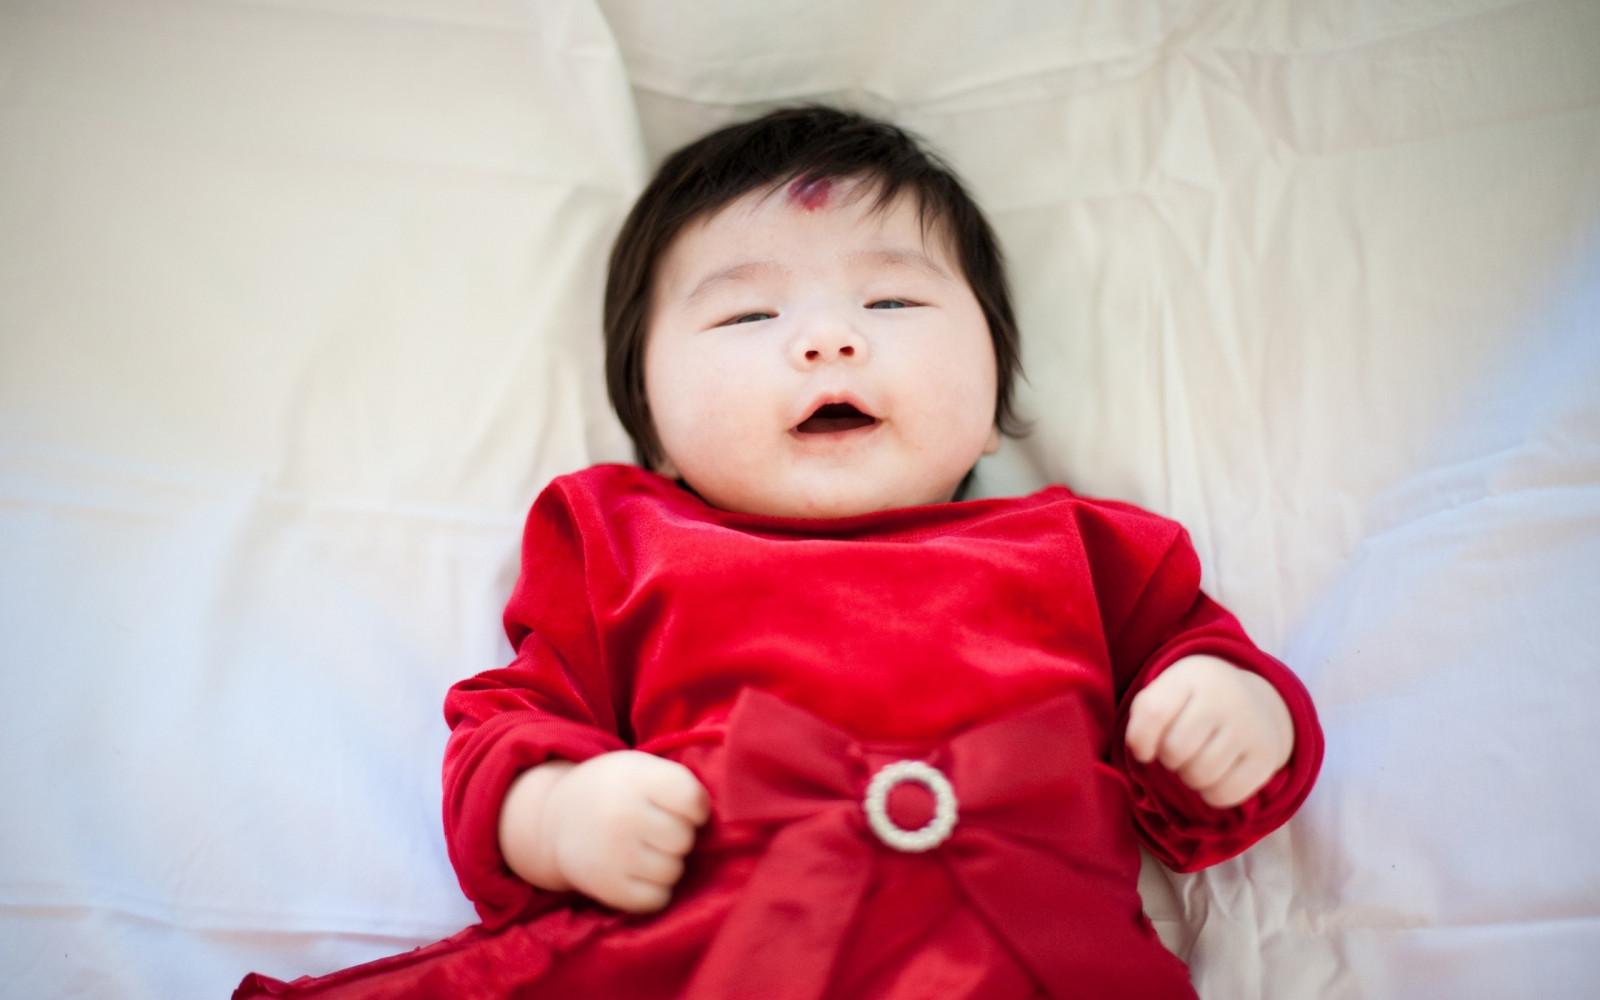 Beautiful baby photos gallery Actress Rambha, Latest News, Photos, Videos on. - Cineulagam